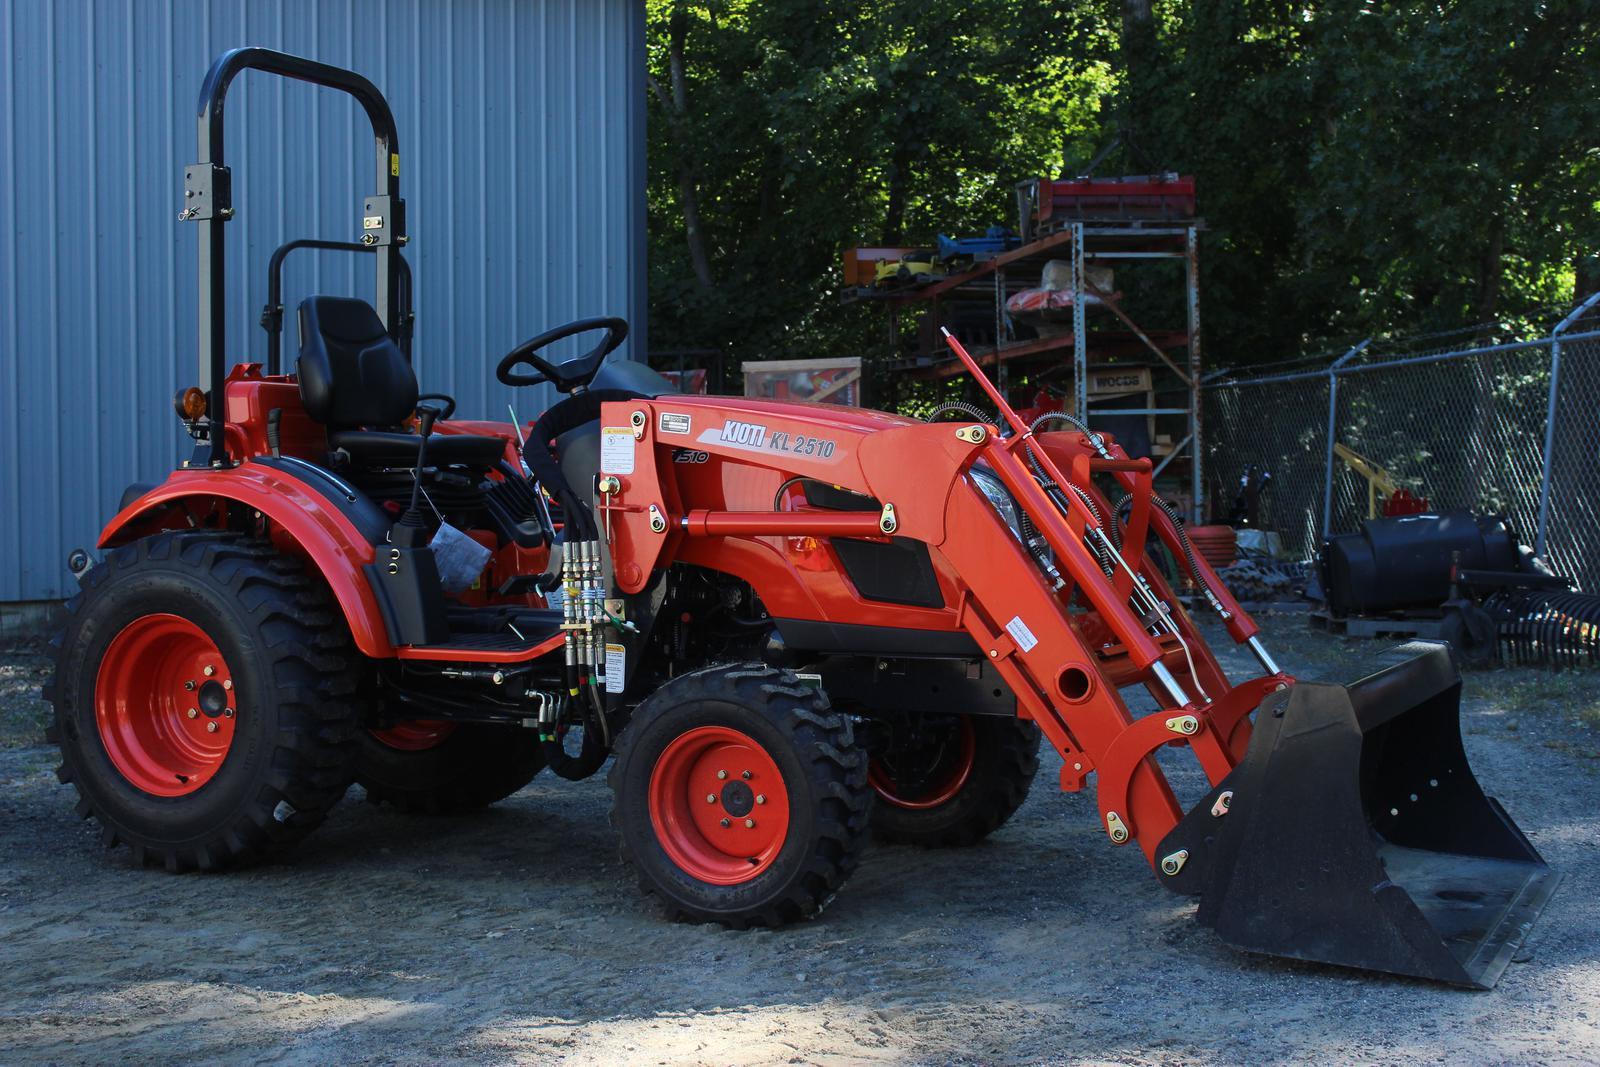 Kioti CK2510 Standard/HST Tractor w/ Loader for sale in Belchertown